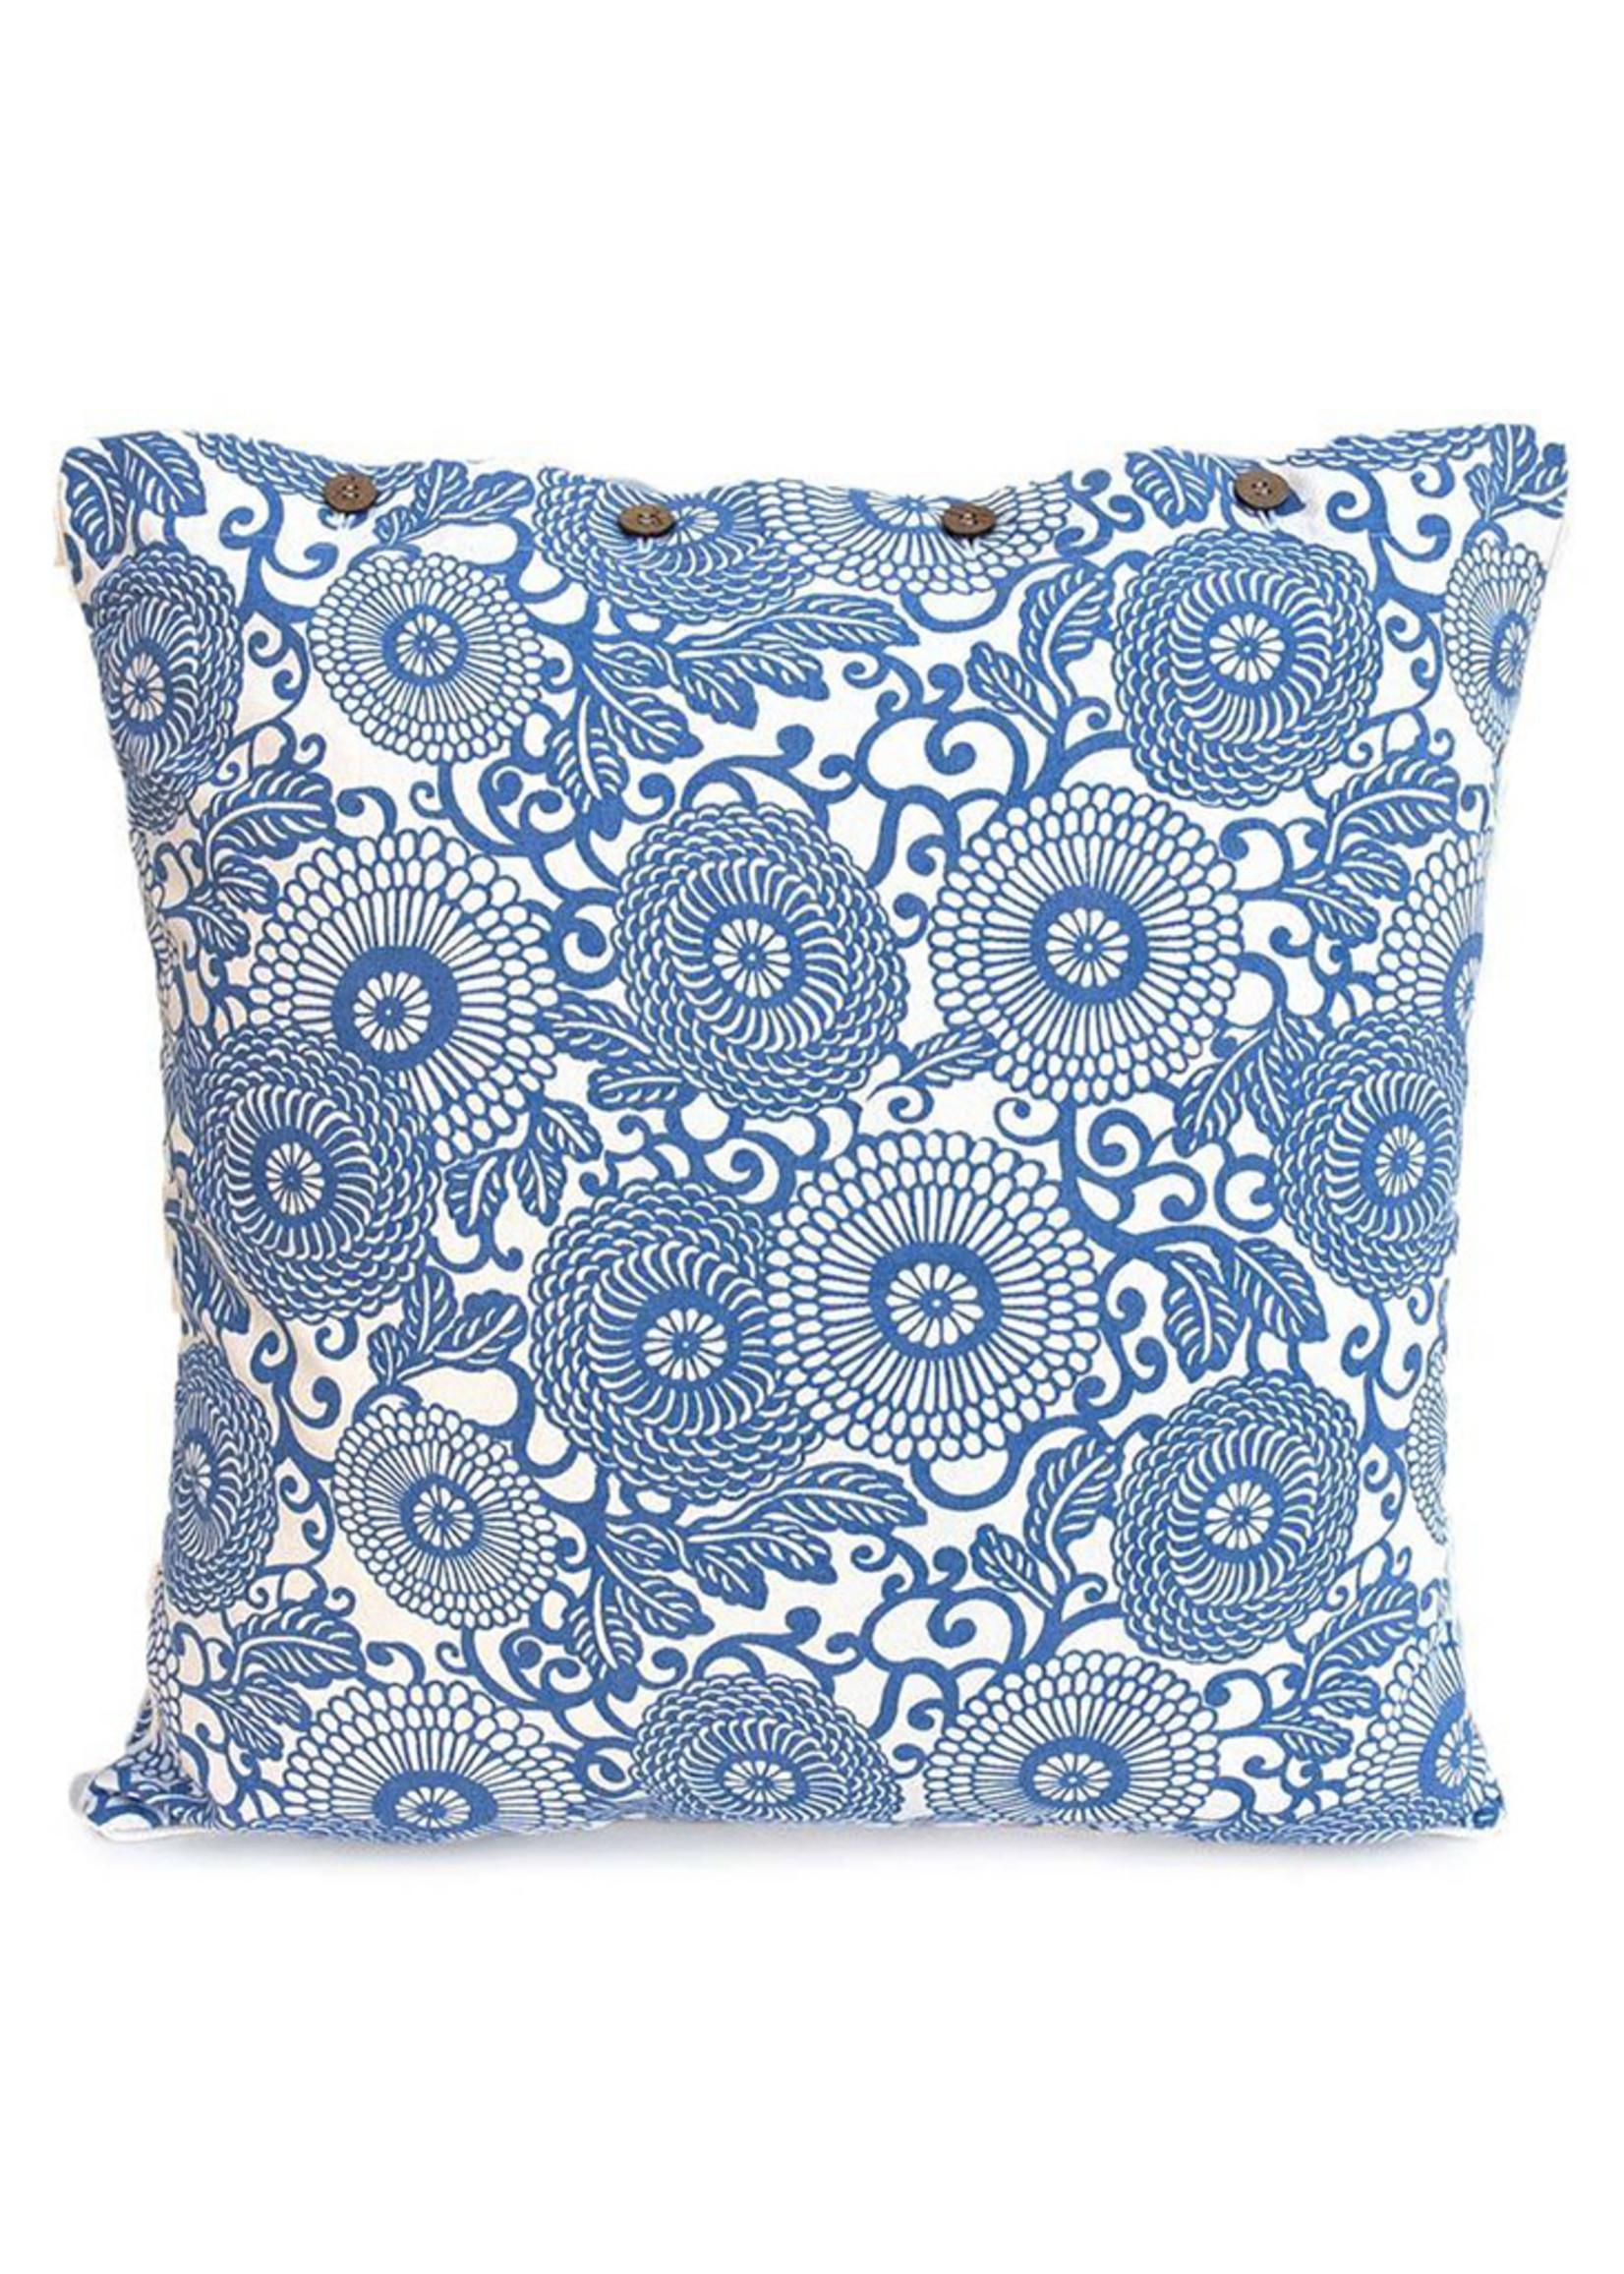 Craft Studio Anthea Cushion Cover 40x40cm